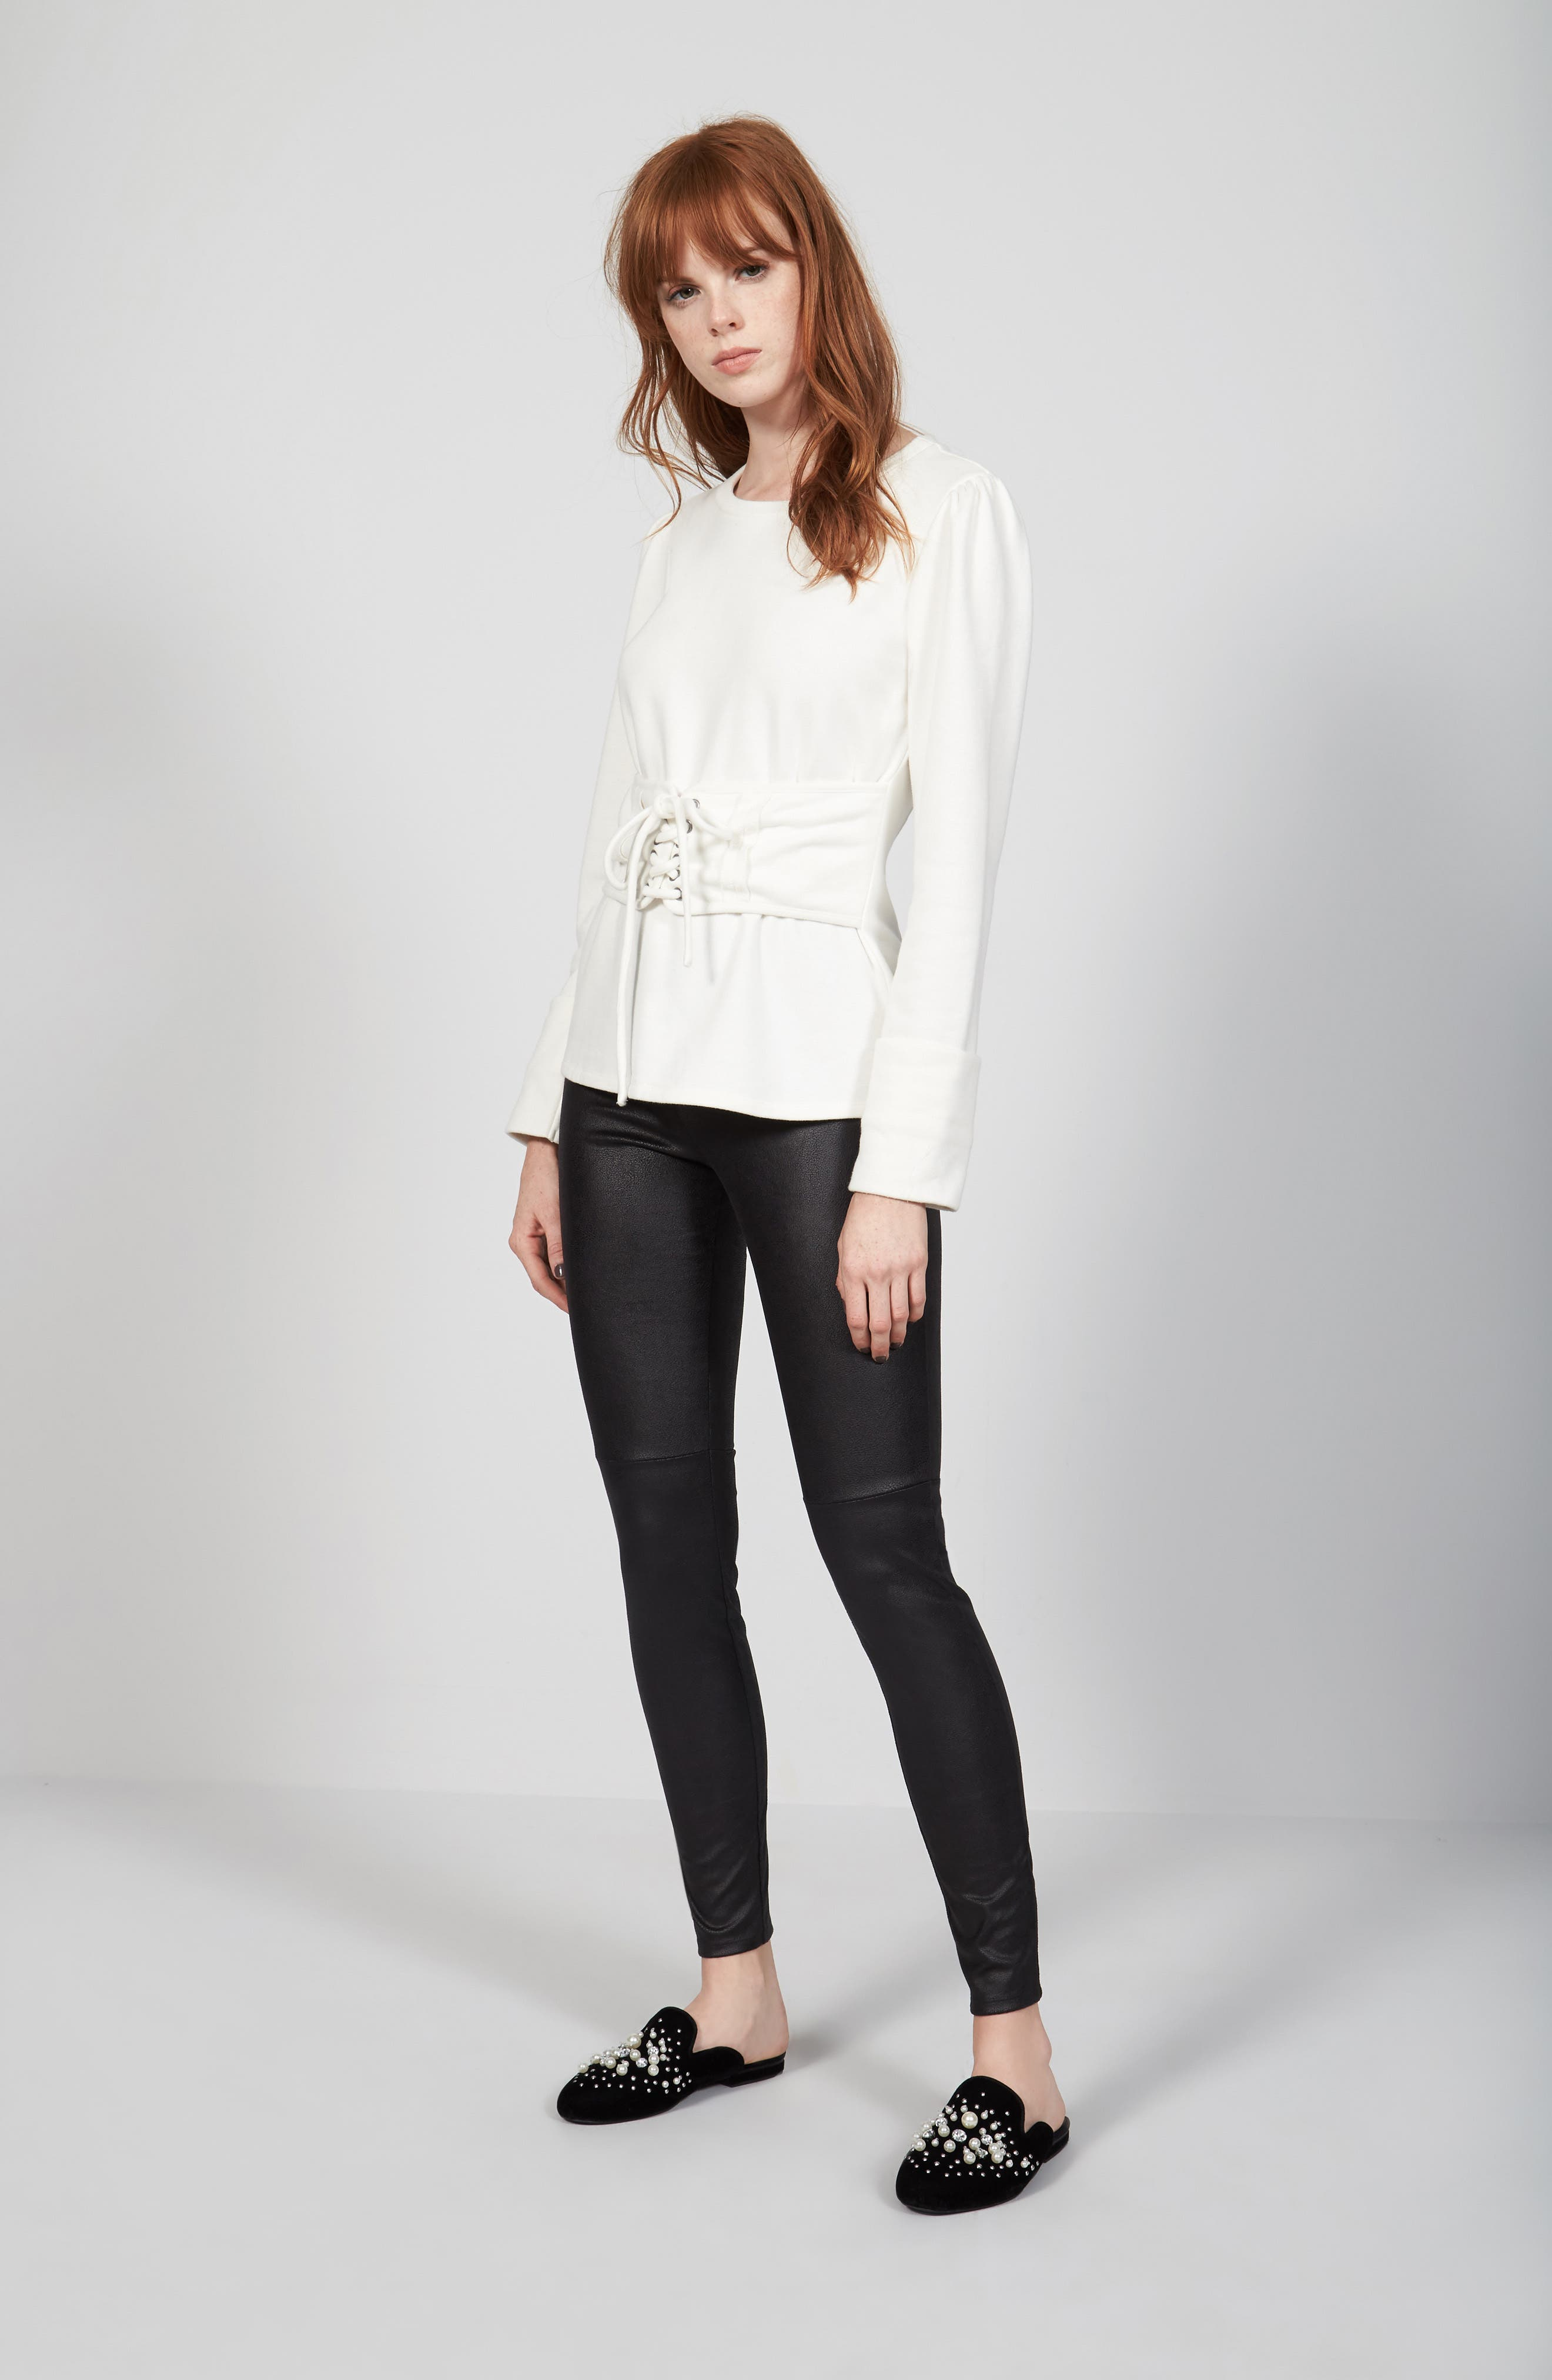 Trouvé Sweatshirt & Leggings Outfit with Accessories